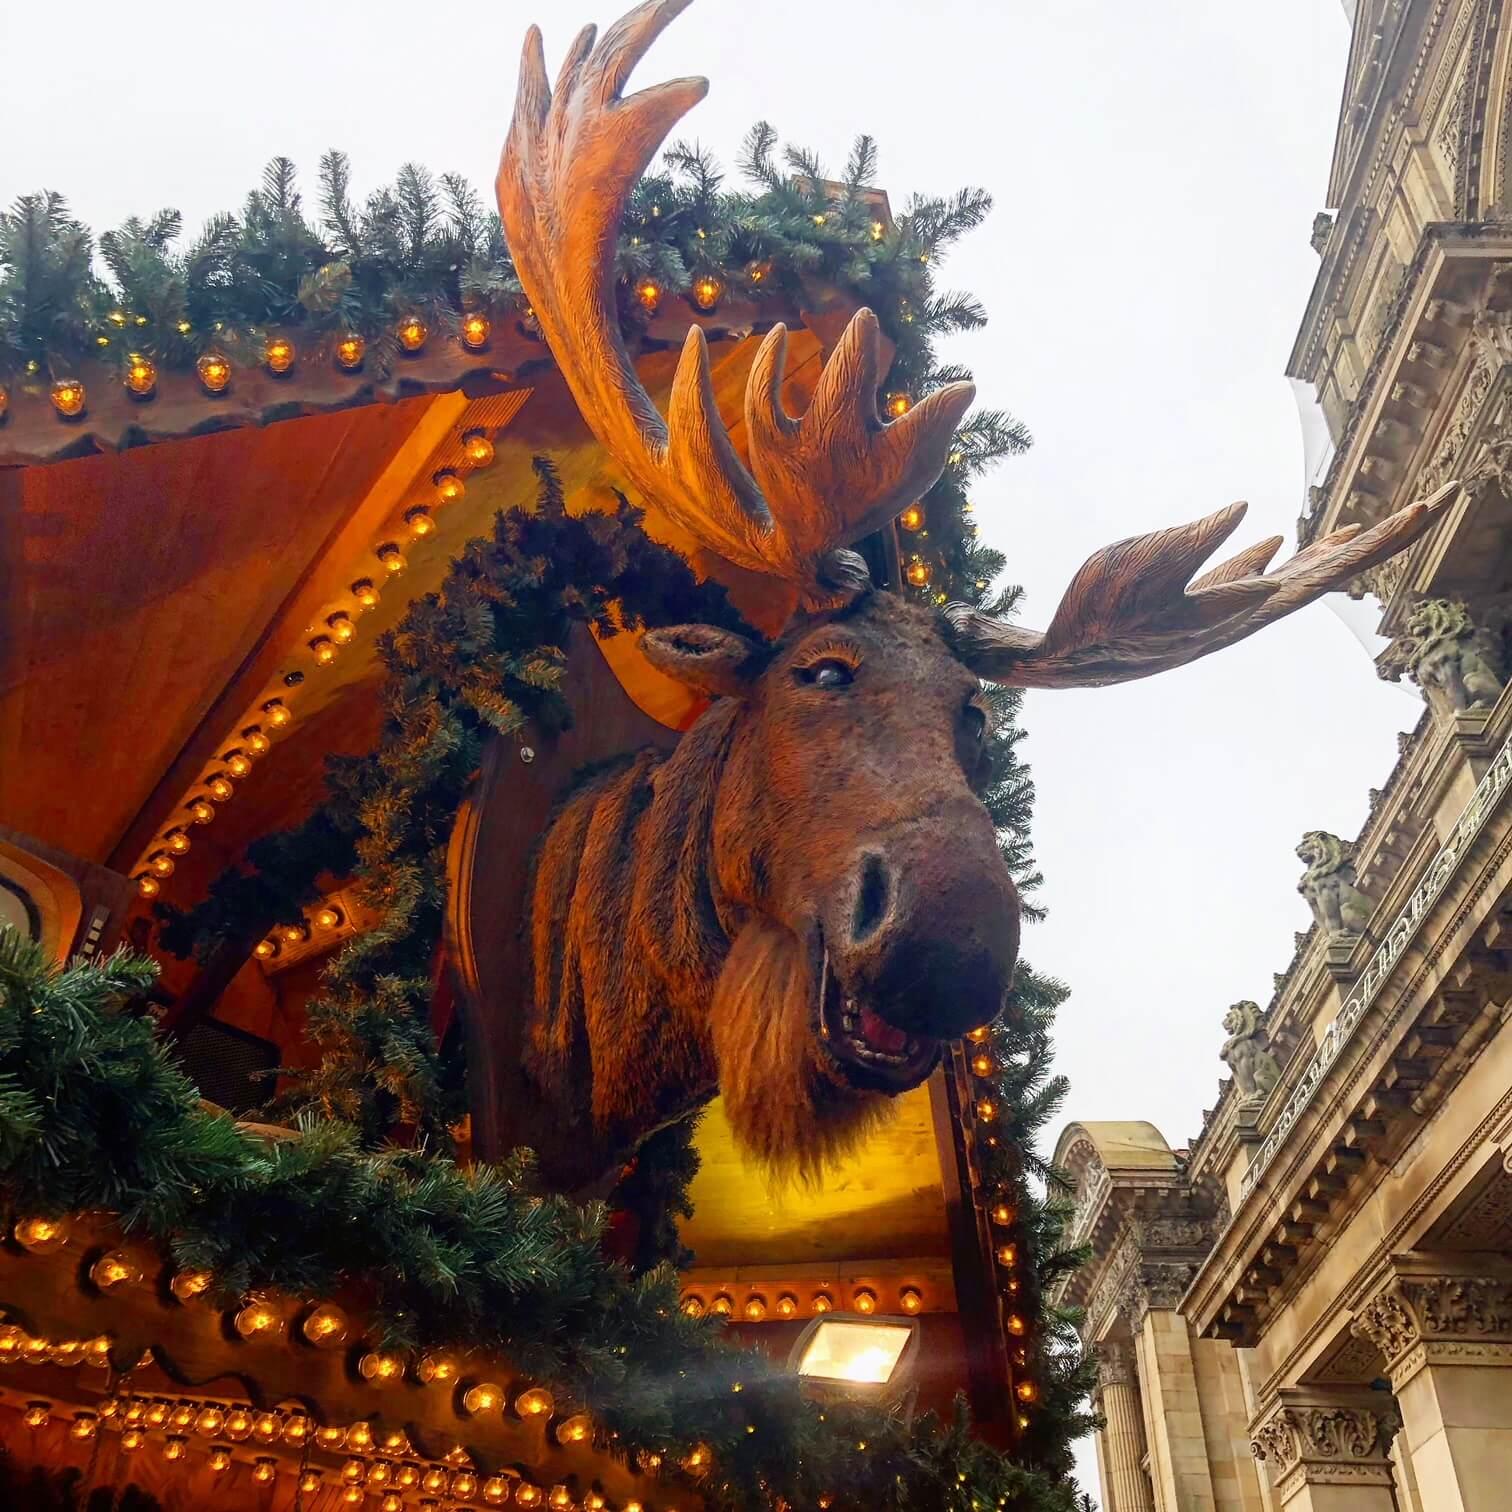 Reindeer at the Birmingham Christmas Market